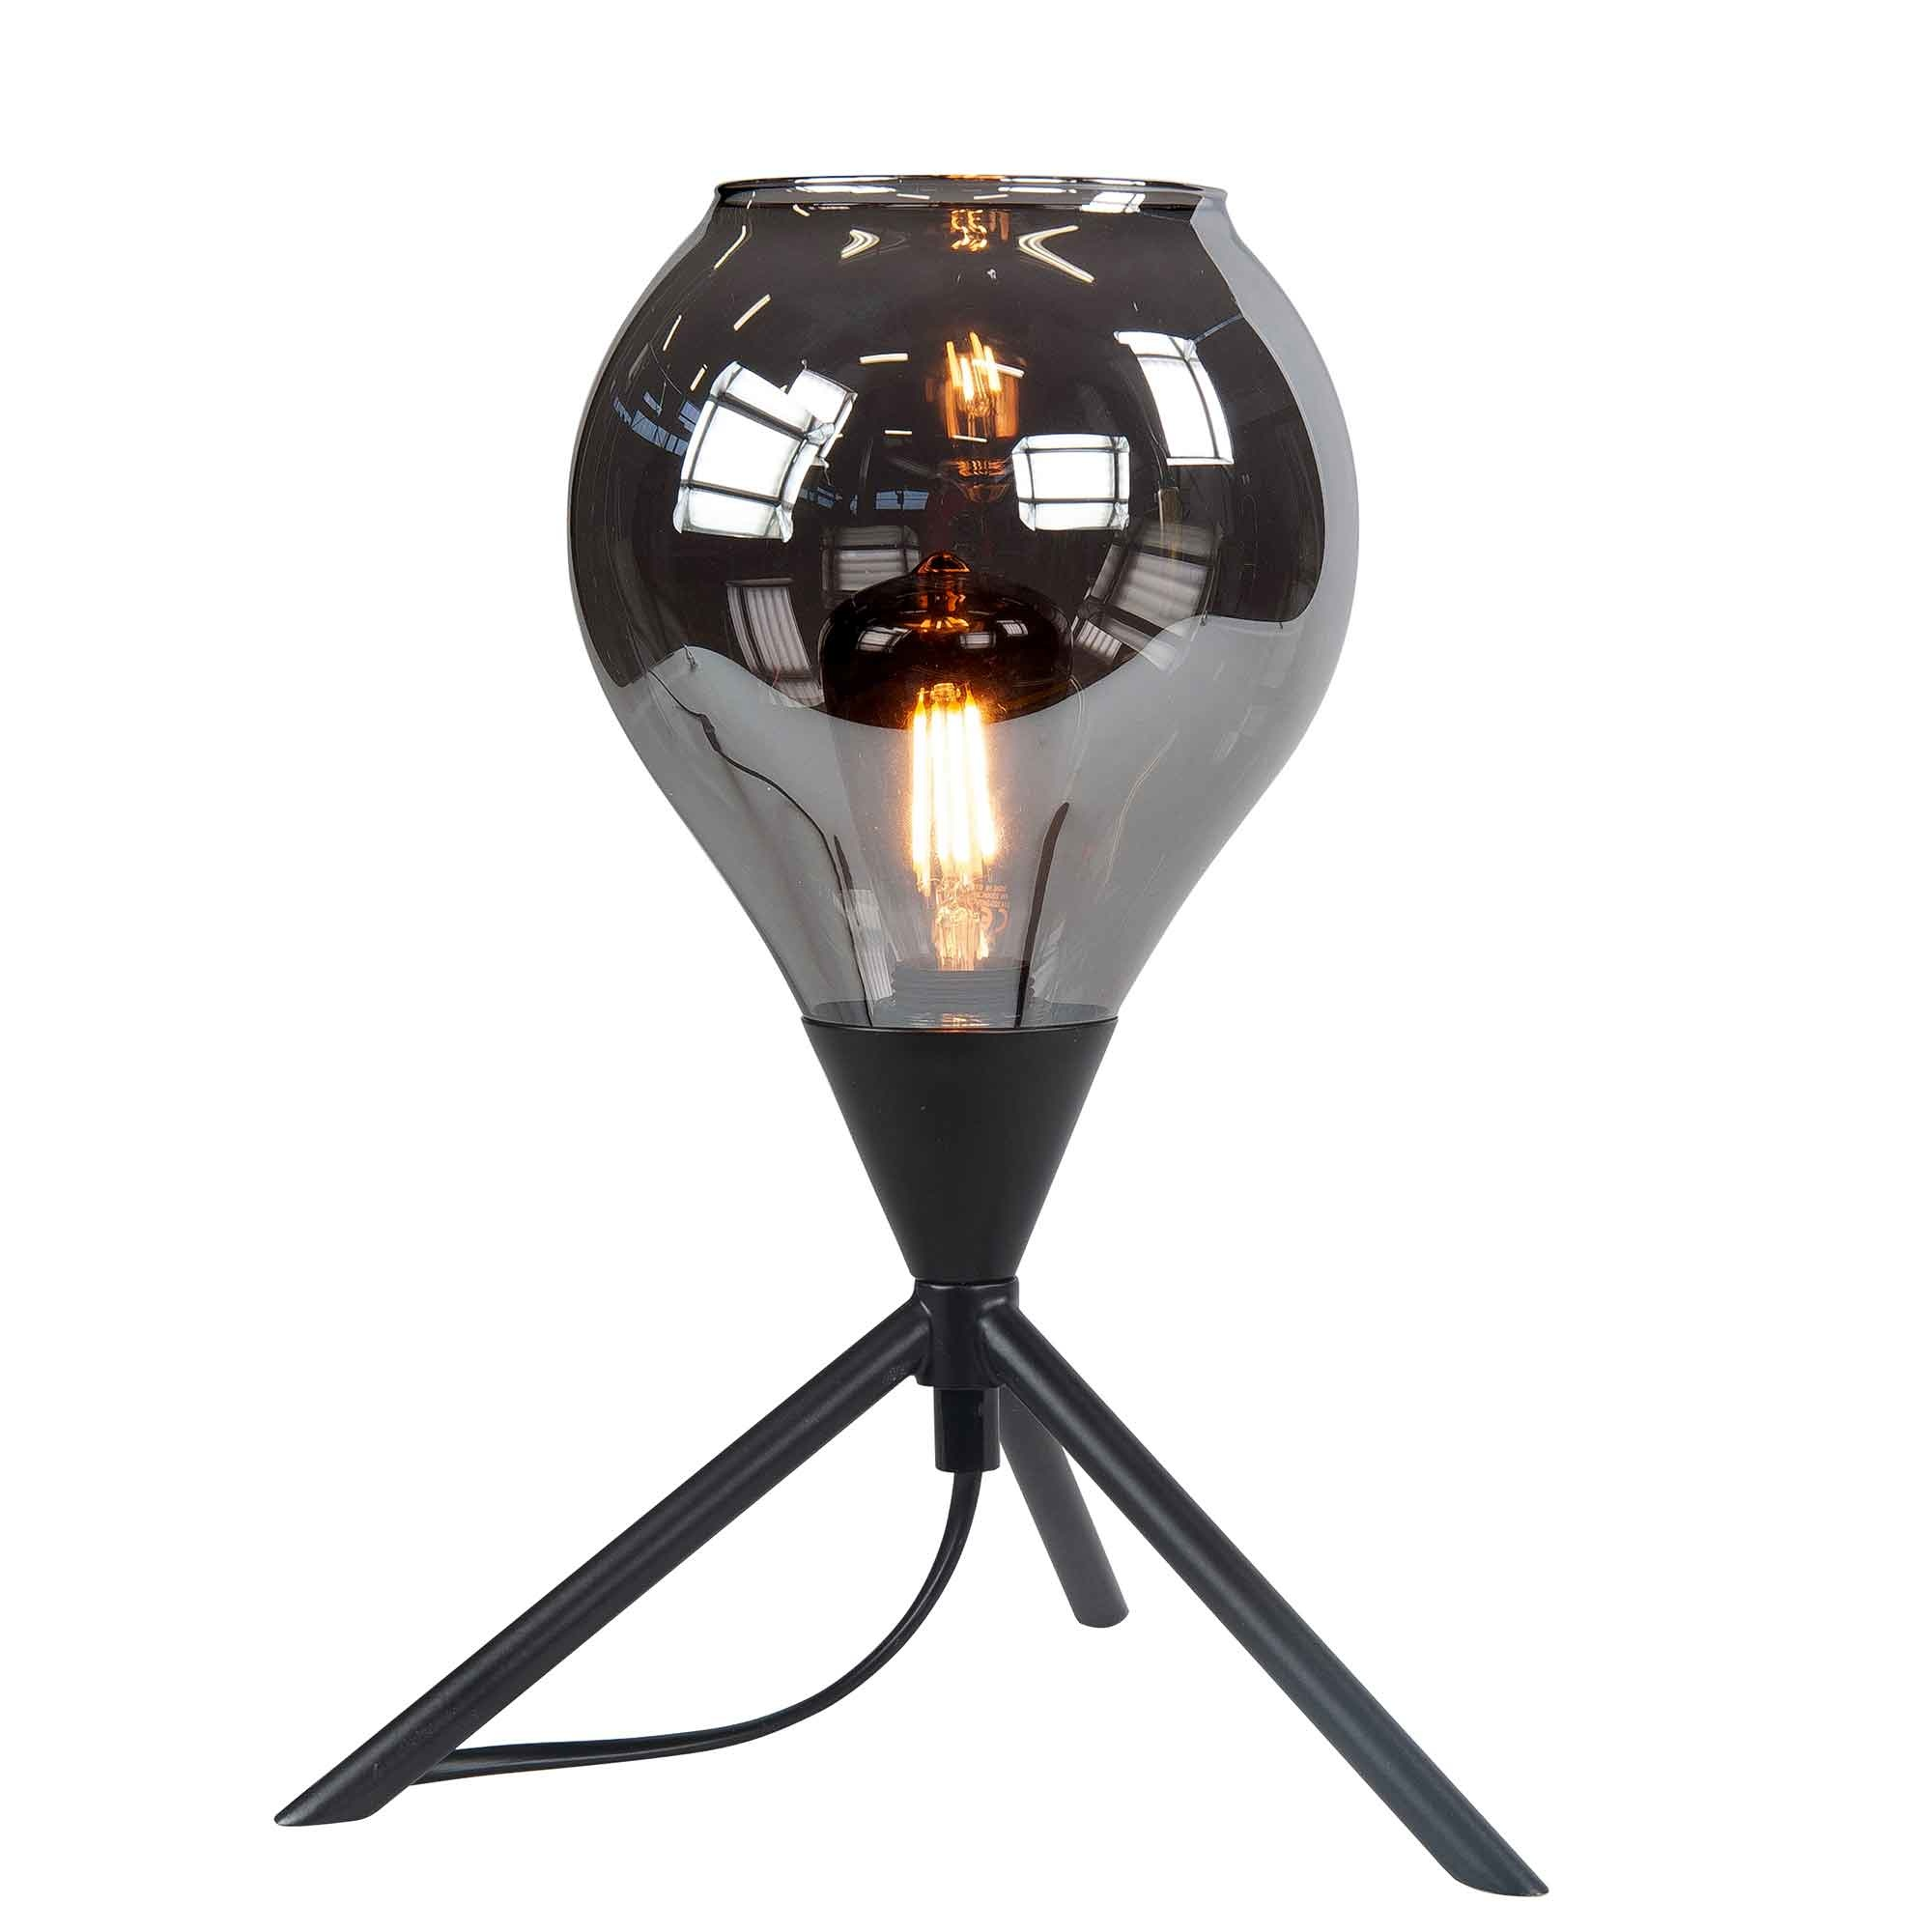 Highlight Tafellamp Cambio H 31 cm Ø 22 cm zwart